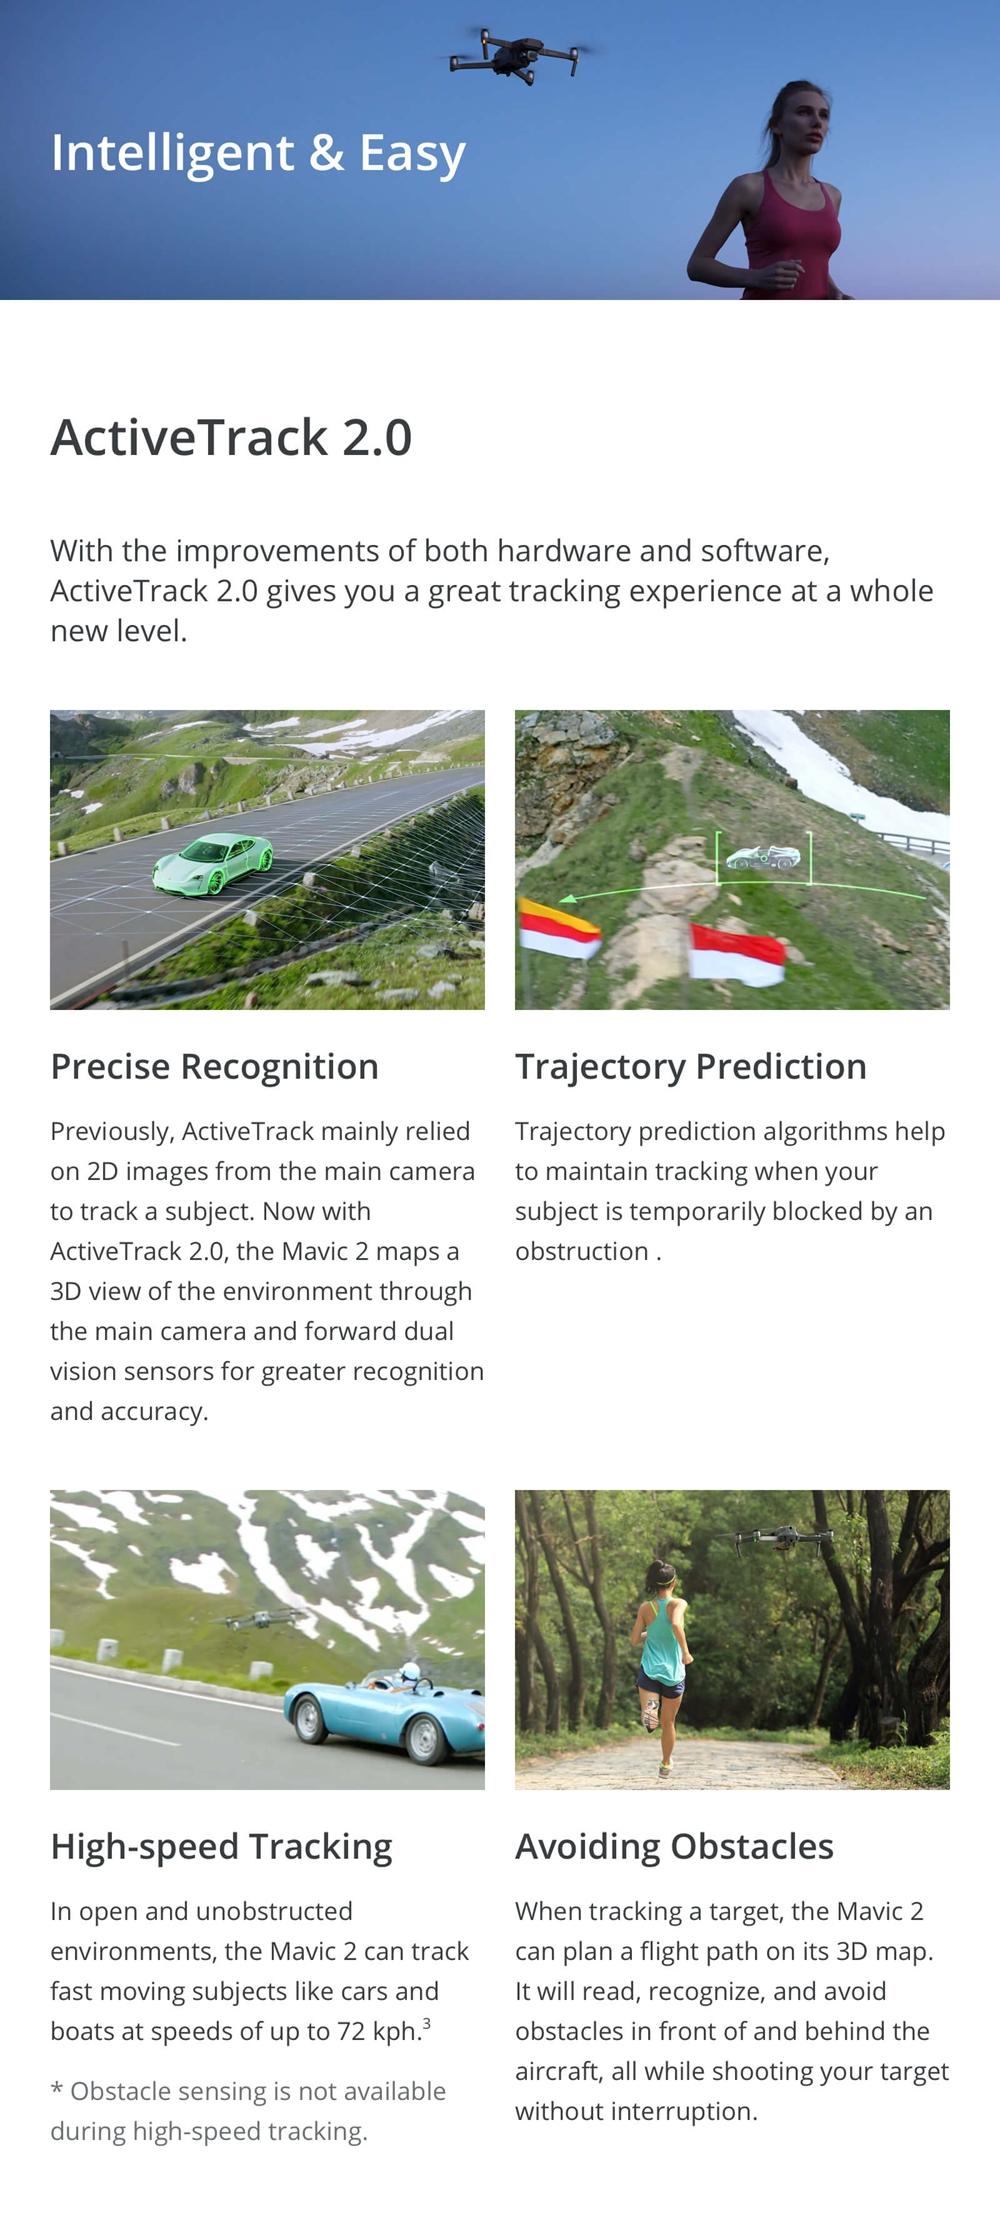 DJI Mavic 2 Pro / Zoom 8KM 1080P FPV w/ 3-Axis Gimbal 4K Camera  Omnidirectional Obstacle RC Drone